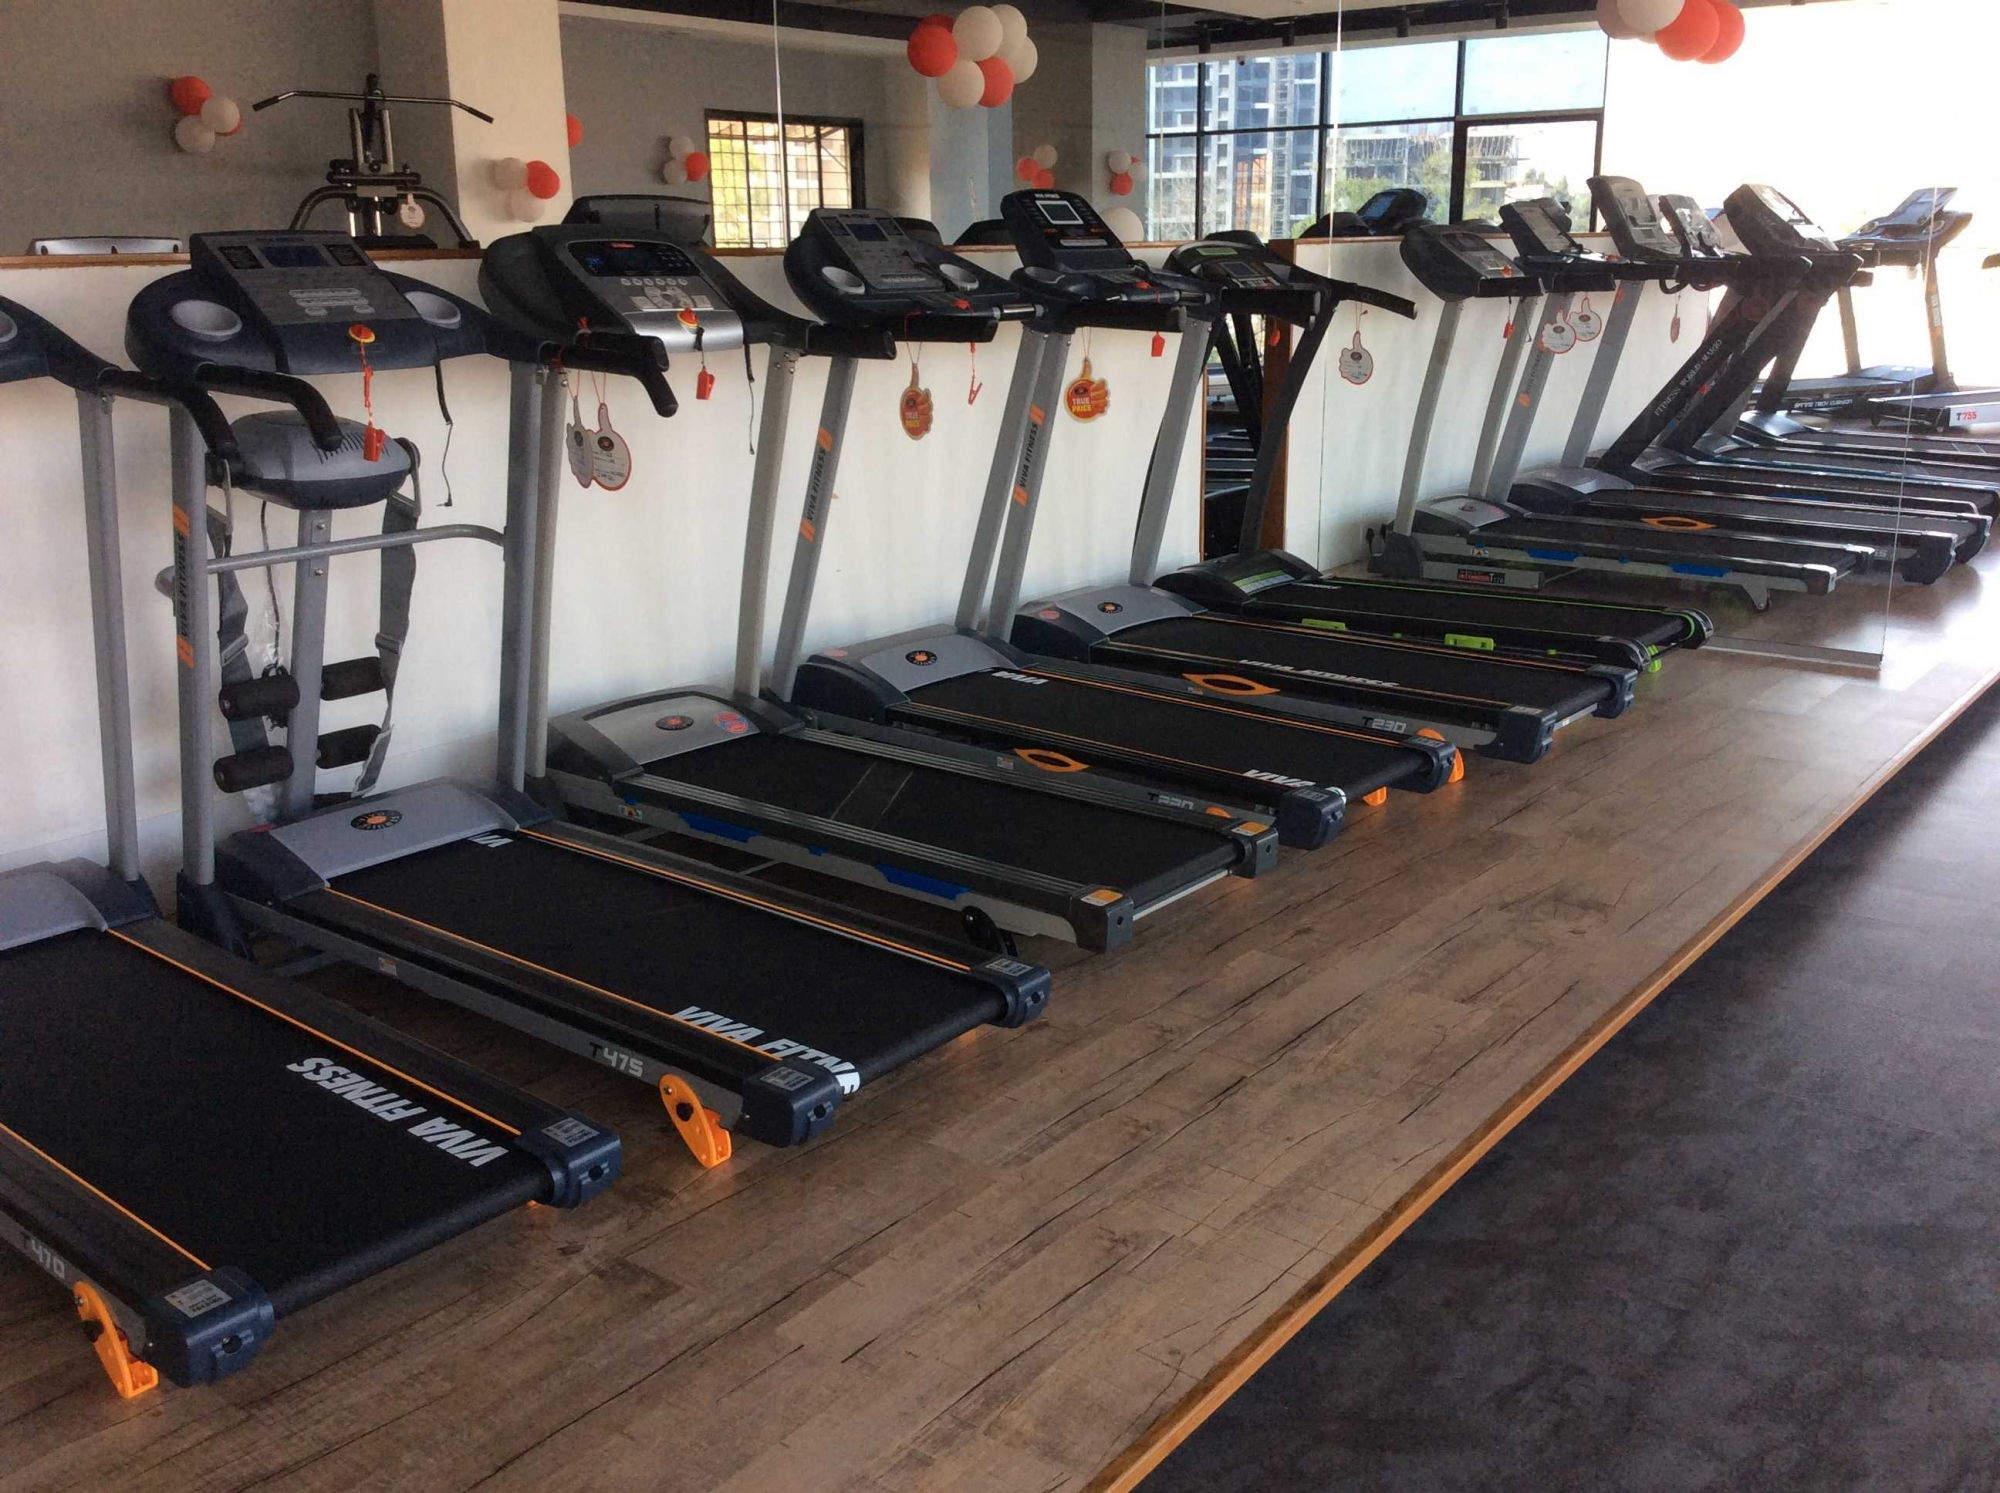 4197e0509510 Fitness Equipment Dealers in Pune - Fitness Equipment Stores - Justdial